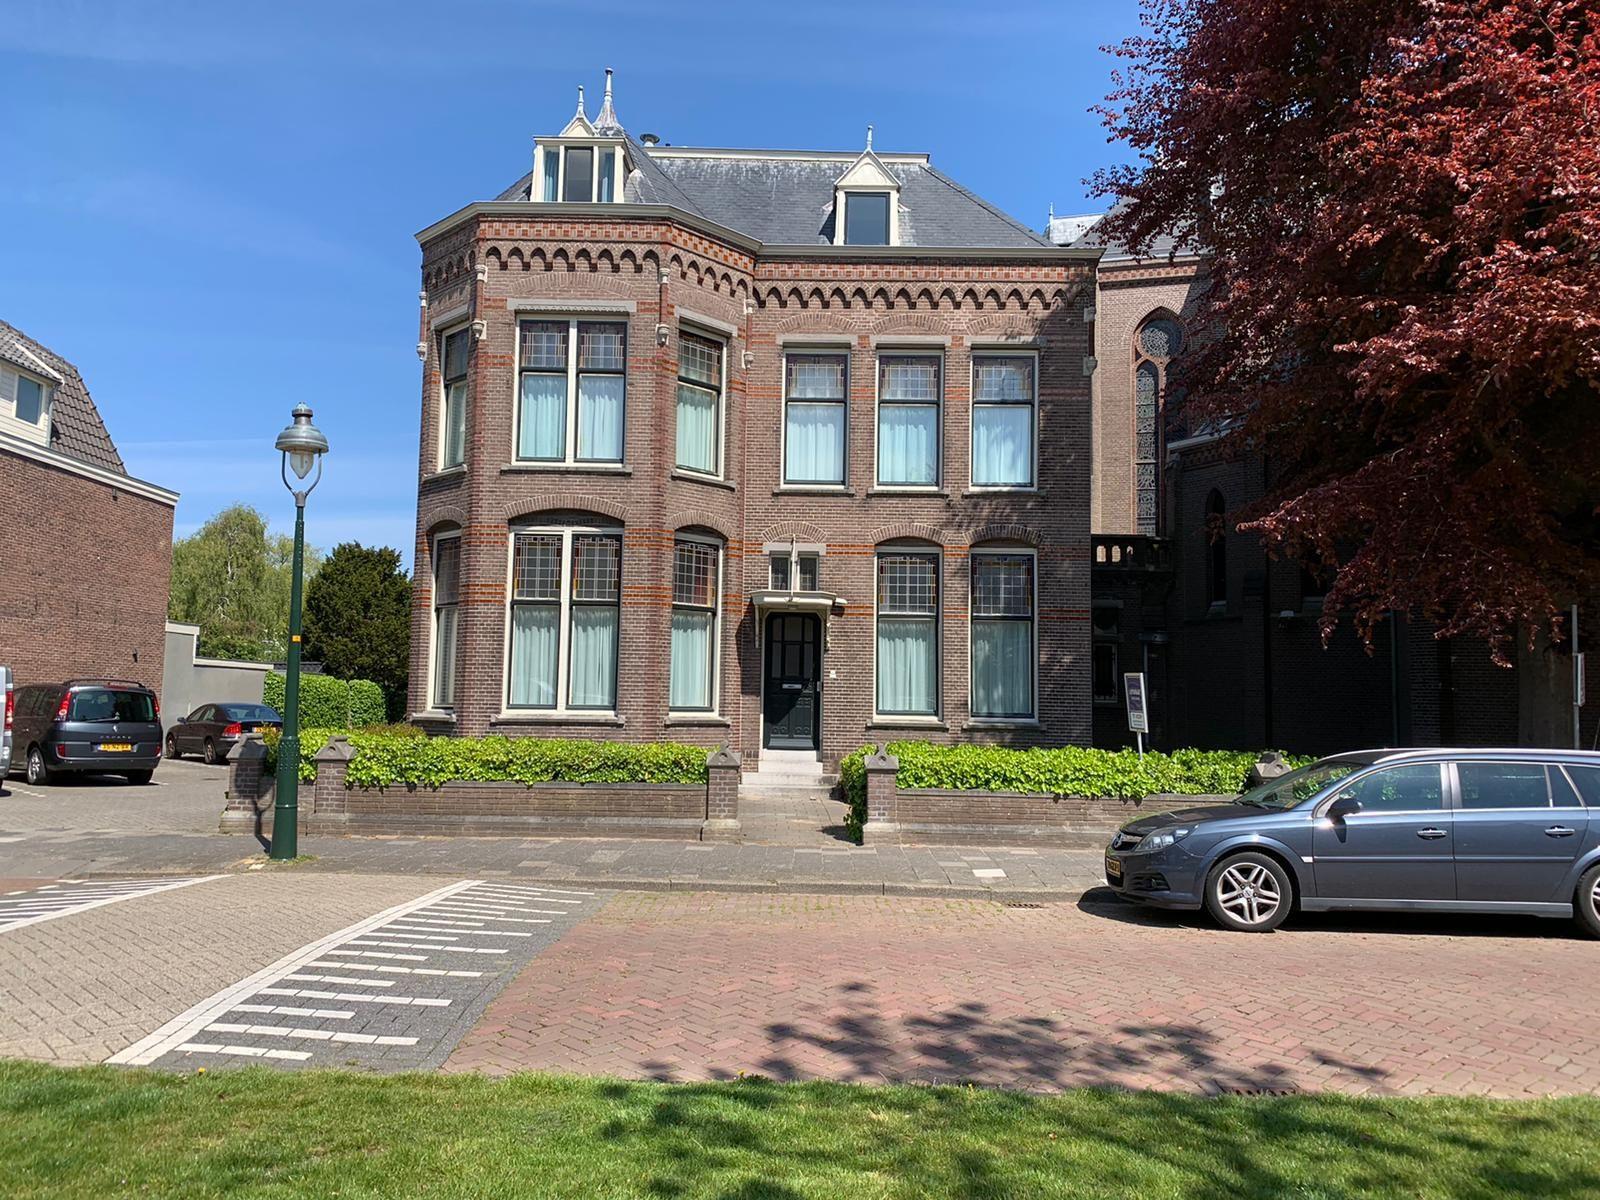 Nassaulaan 4, Alkmaar